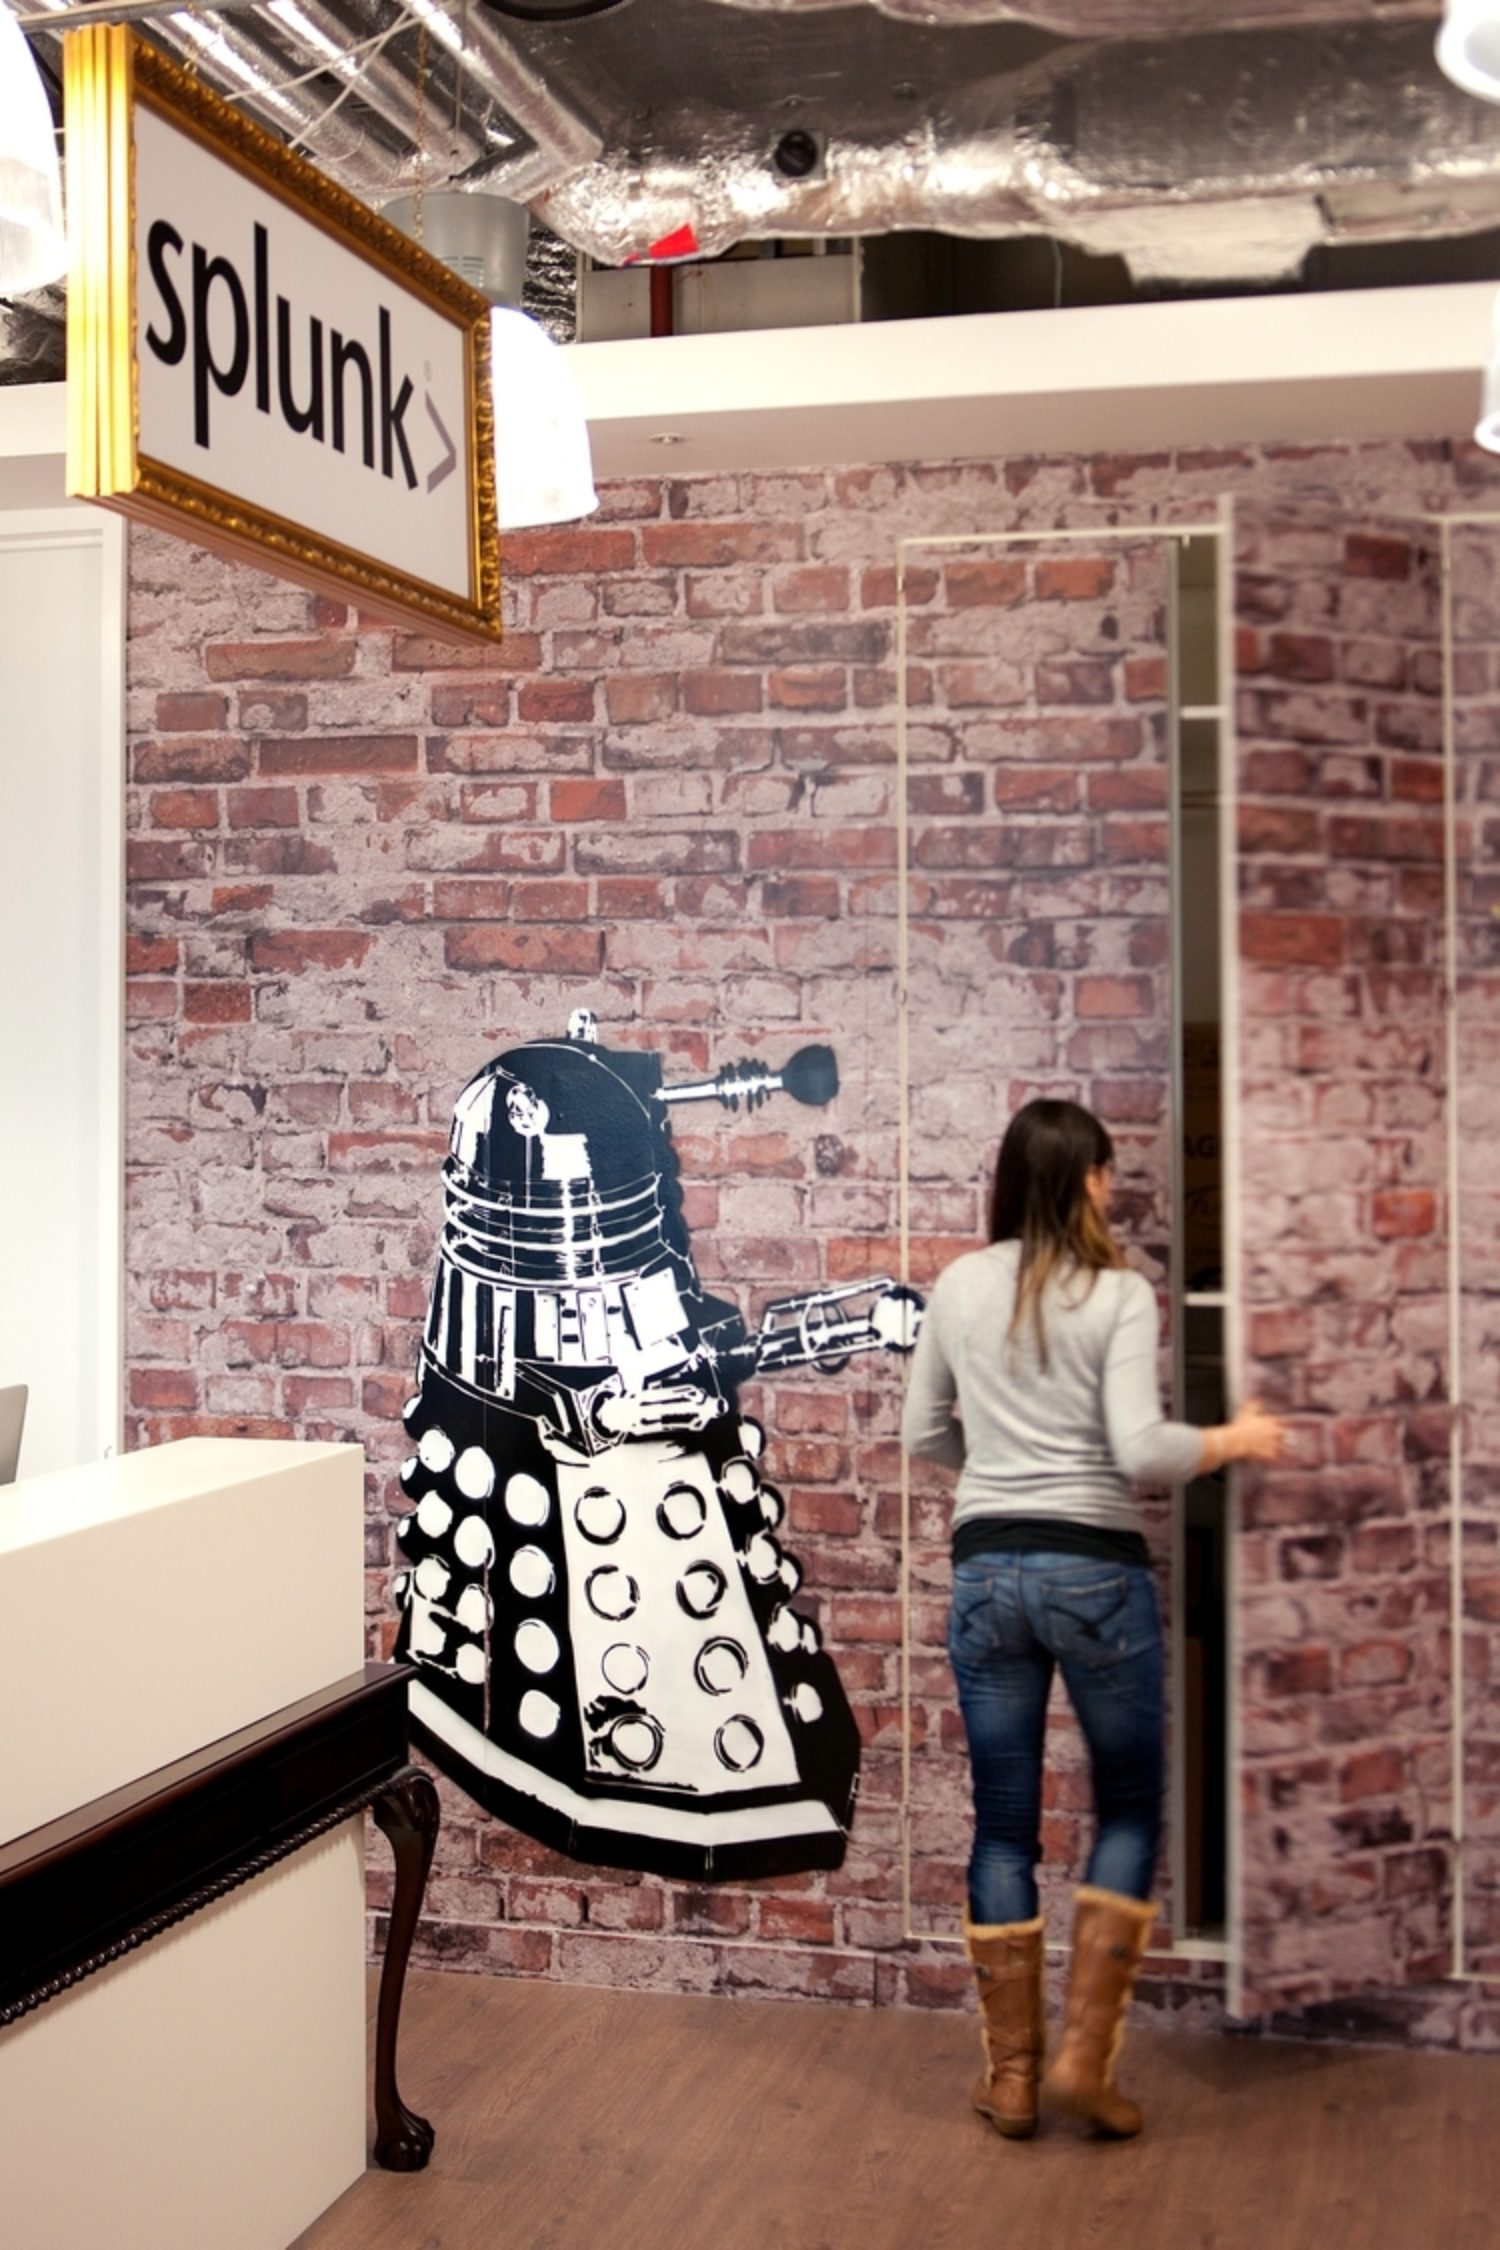 Splunk dalek graffiti in office design